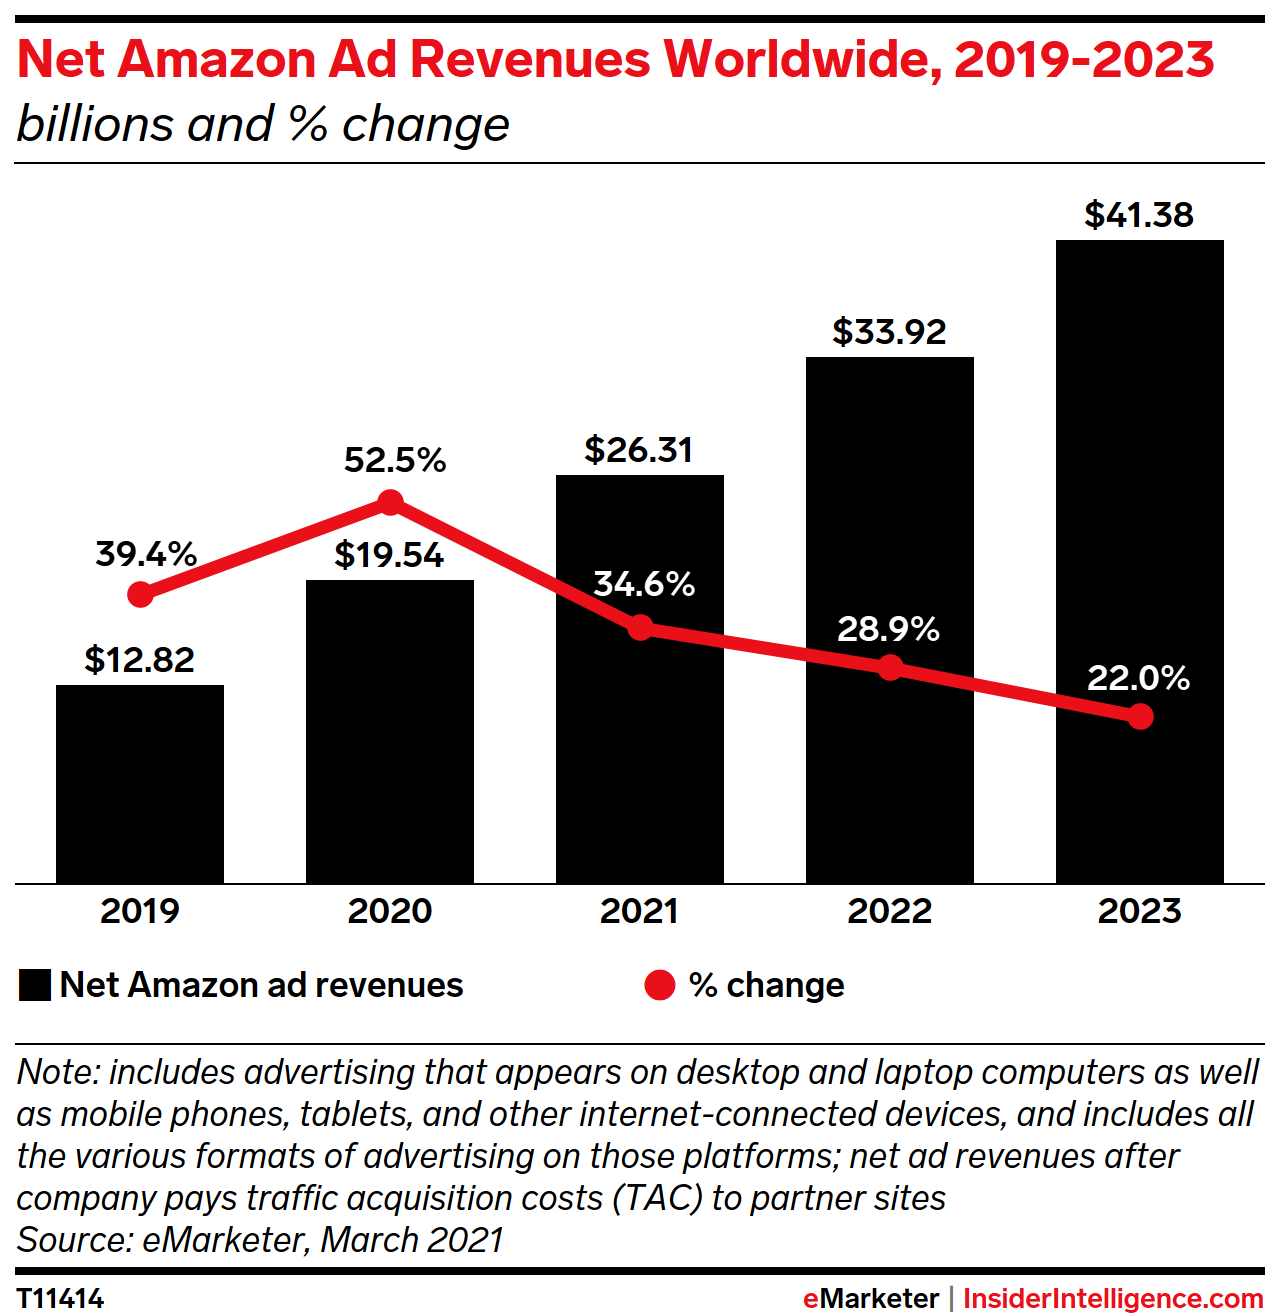 Net Amazon Ad Revenues Worldwide, 2019-2023 (billions and % change)